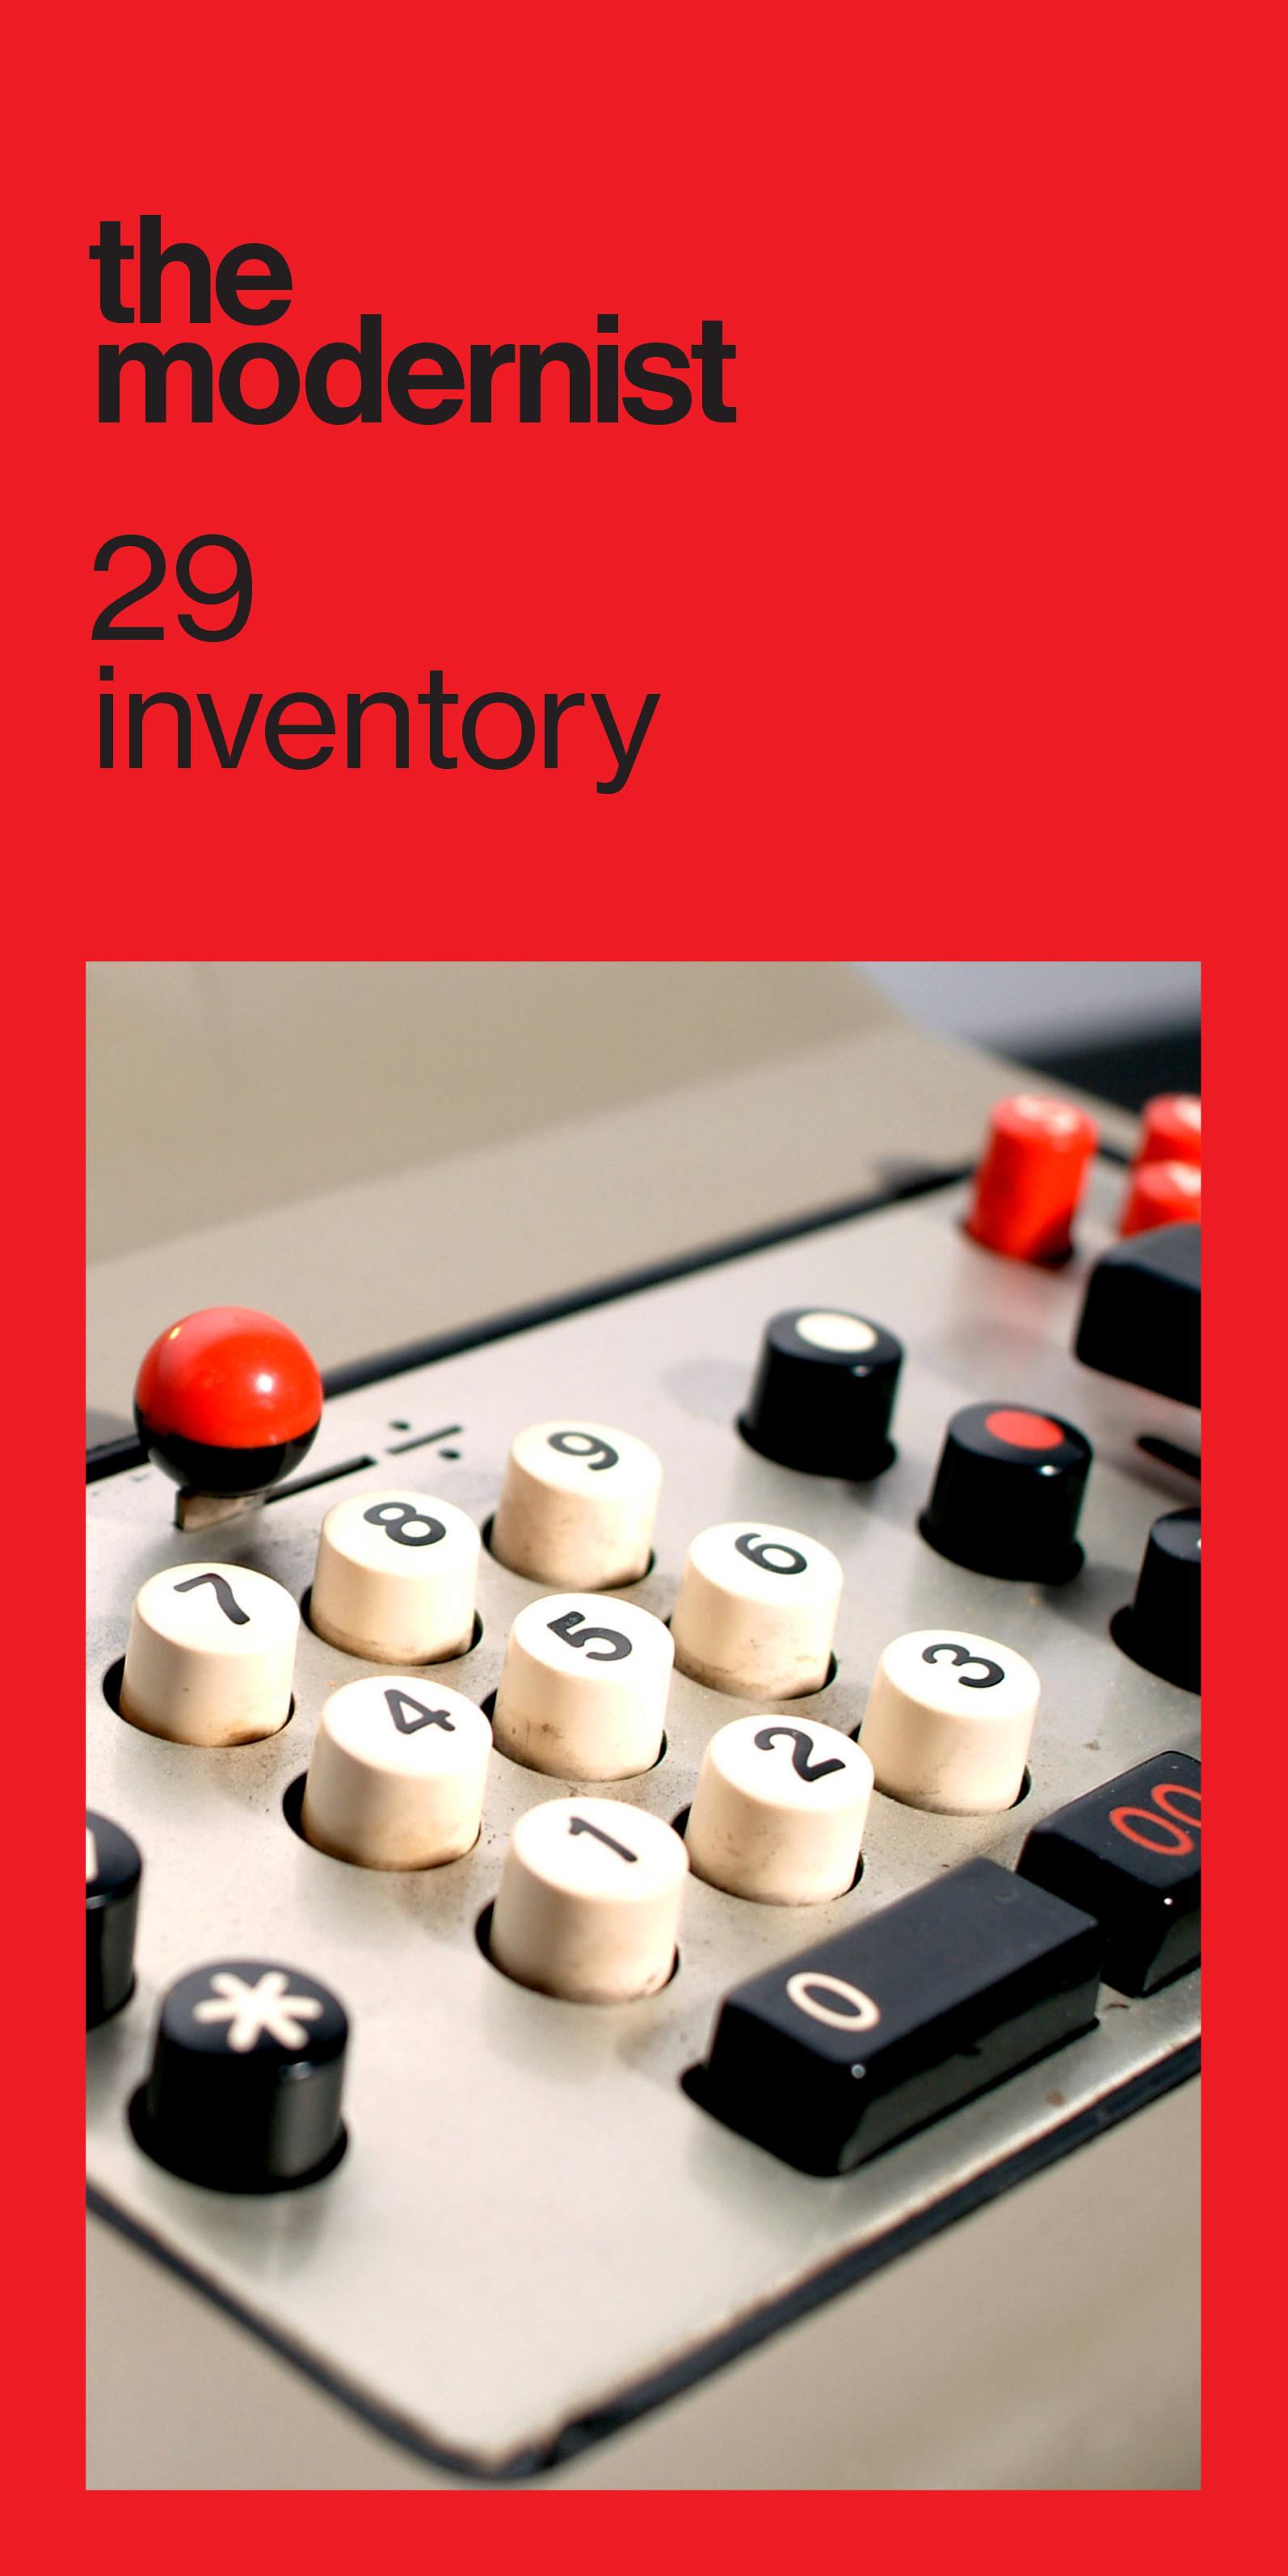 modernist-29-inventory-cover.jpg